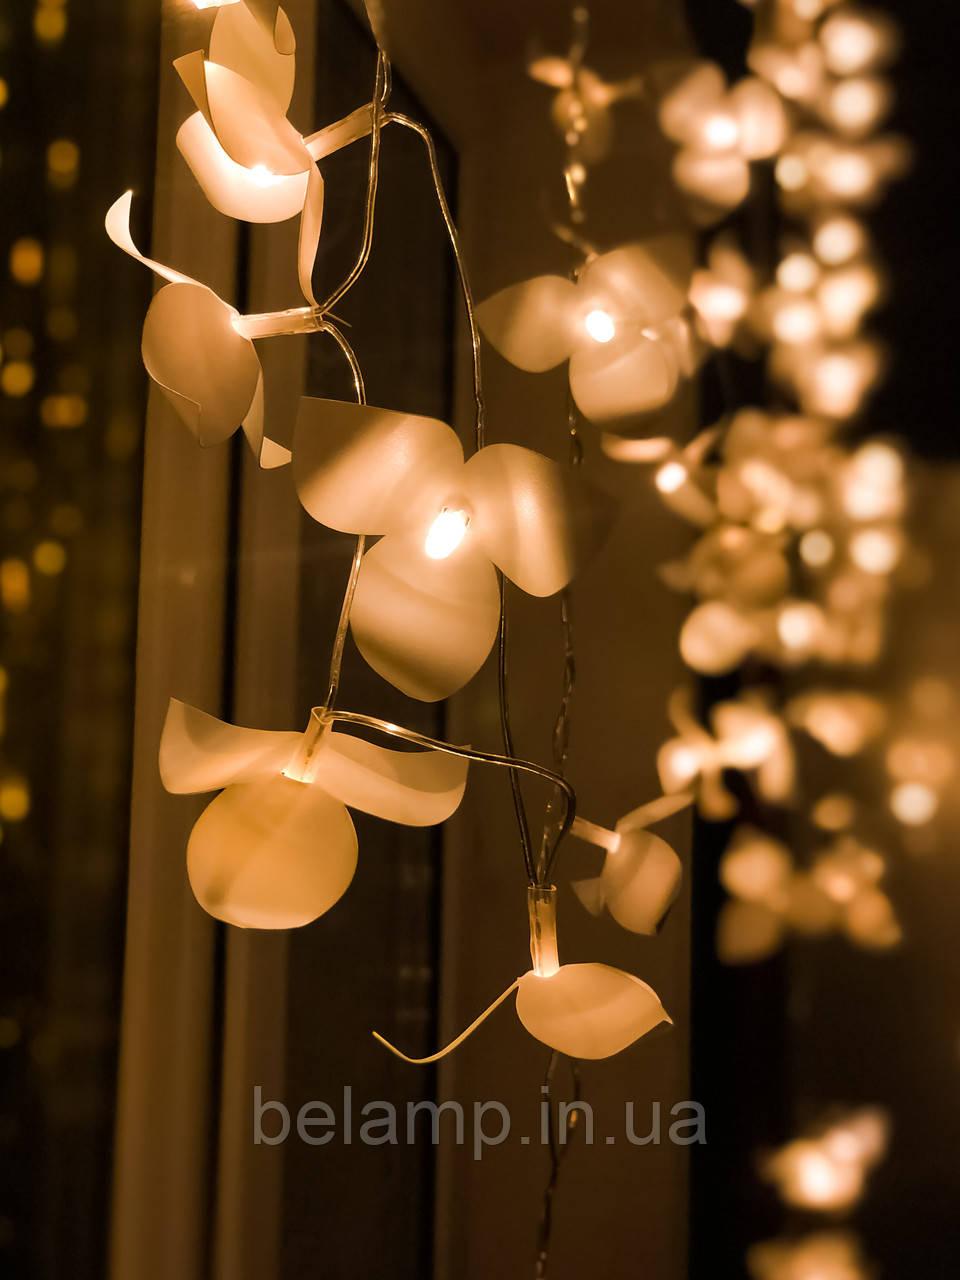 "Гирлянда-бахрома на окно  «Каскад орхидей"""